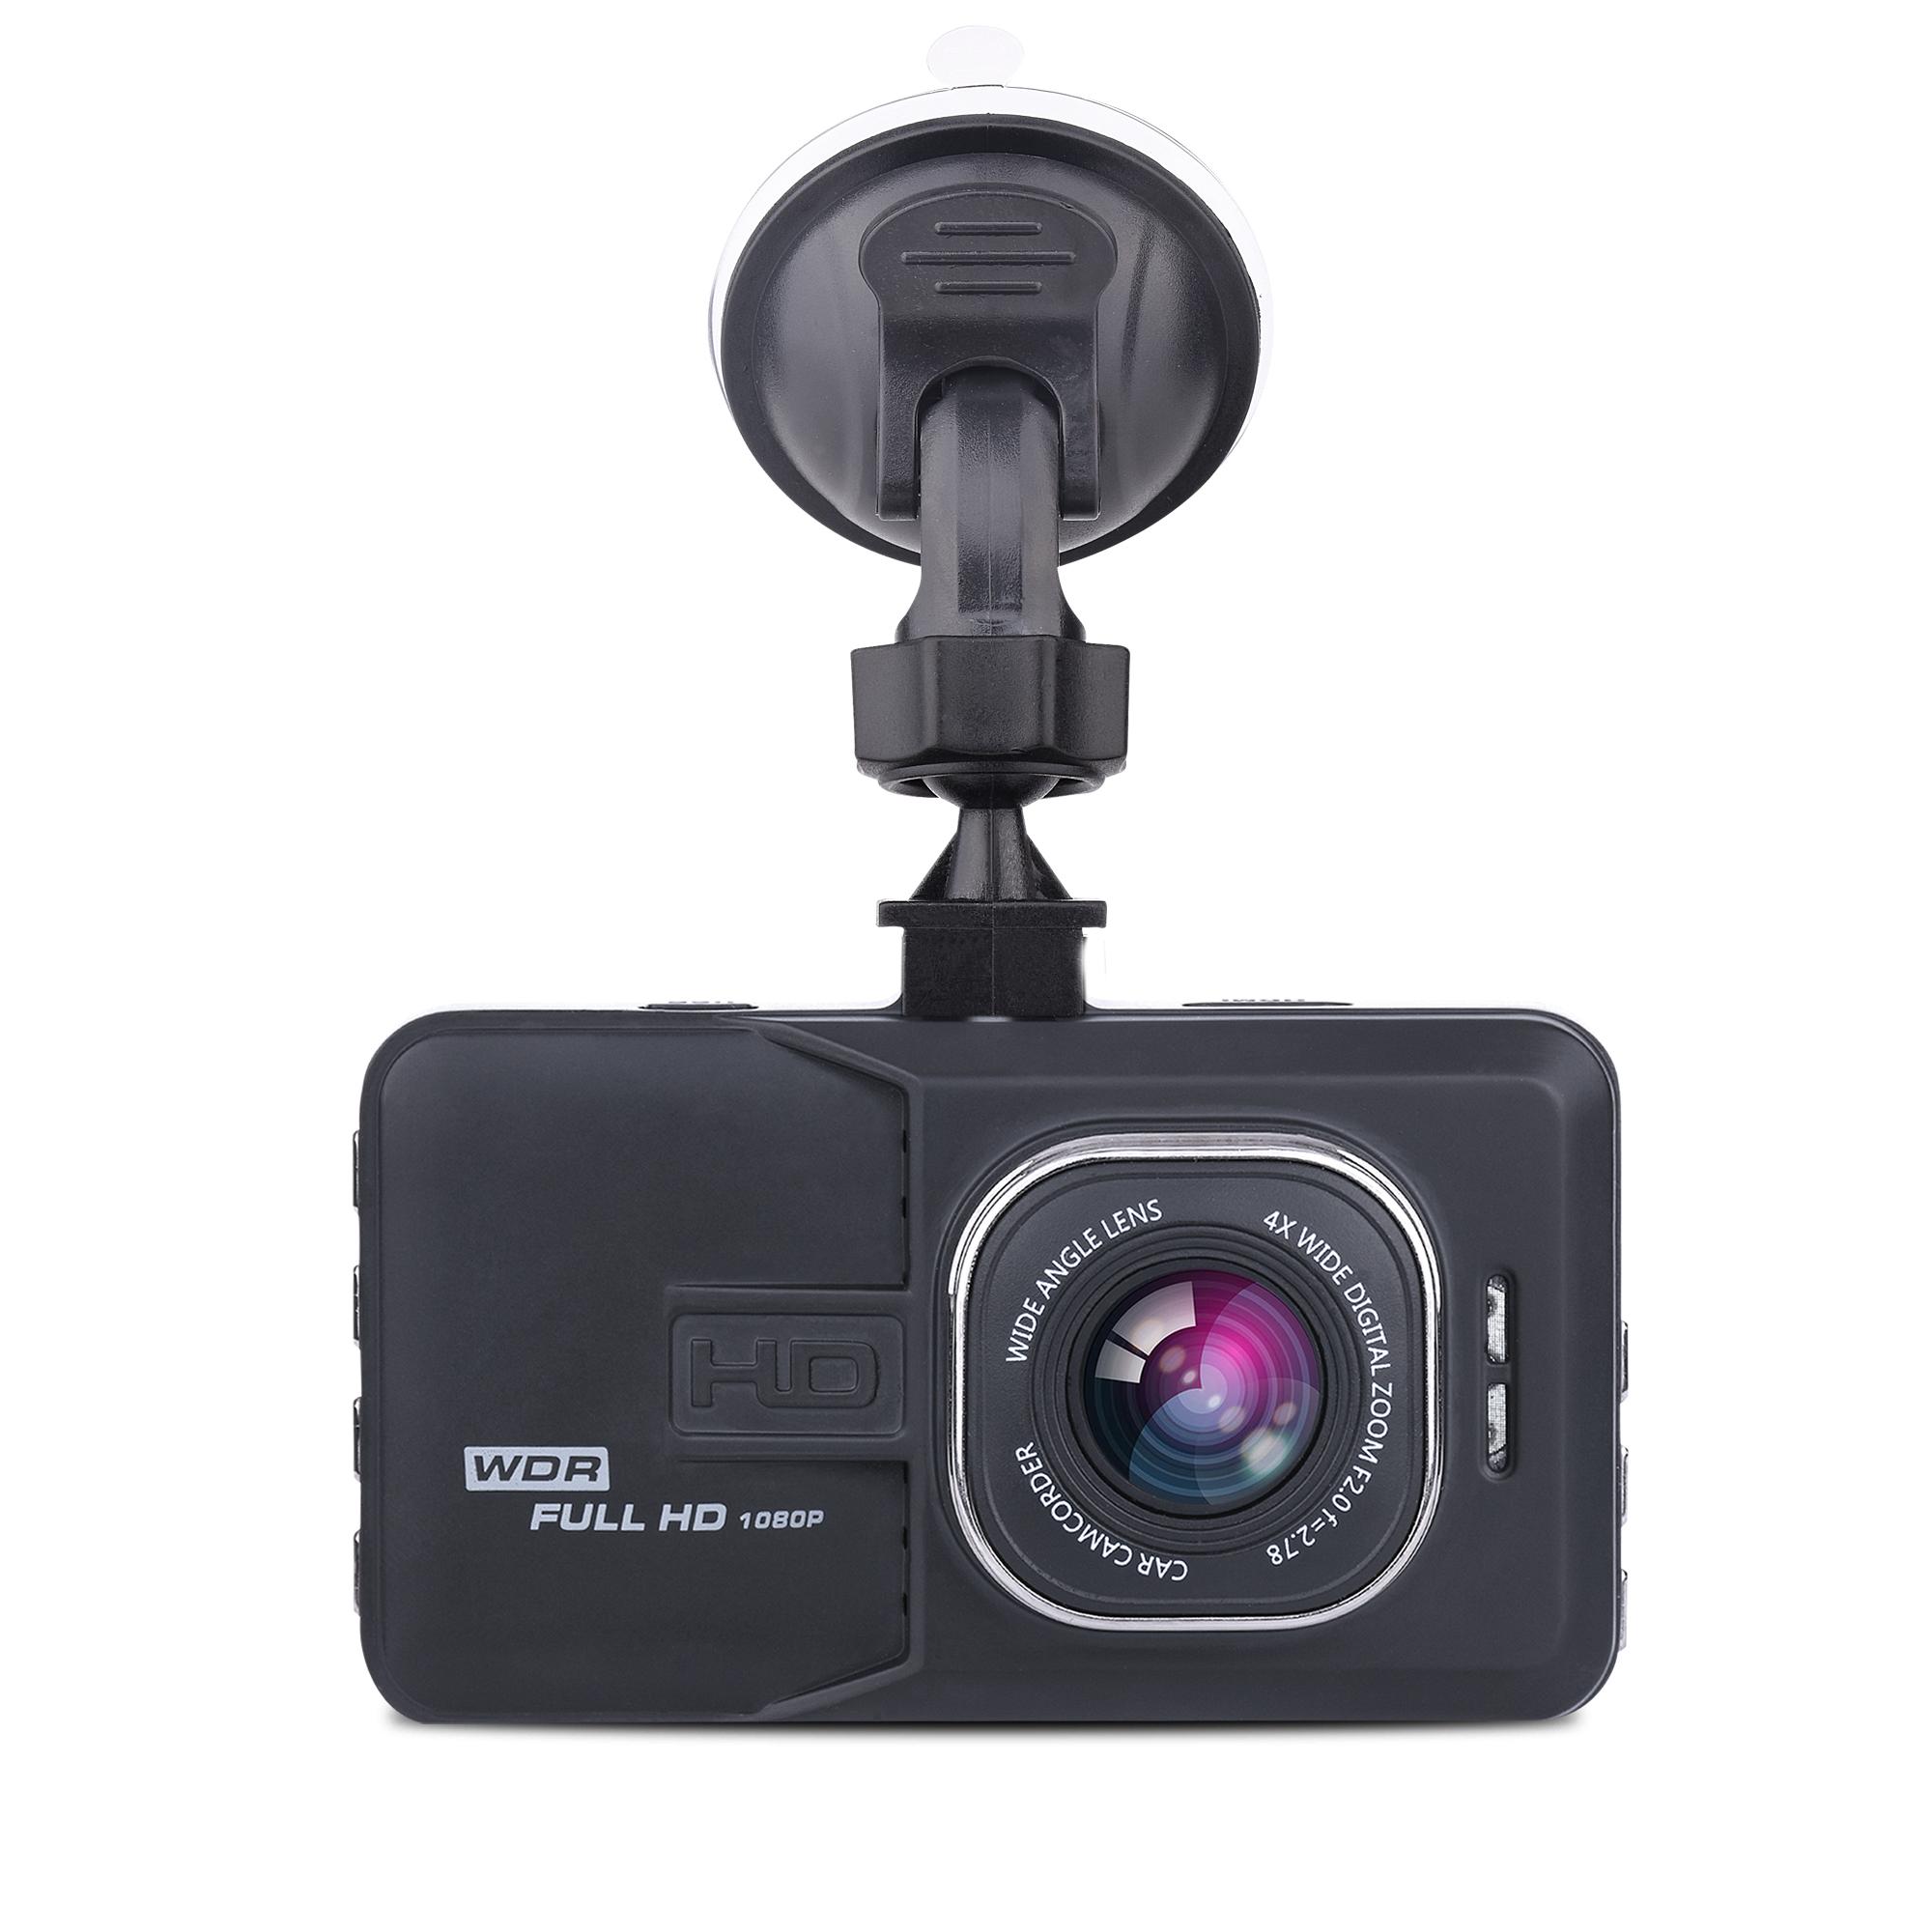 3.0inch screen 1080P FHD 140 degree wide FOV Loop recording Parking recording DVR car camera